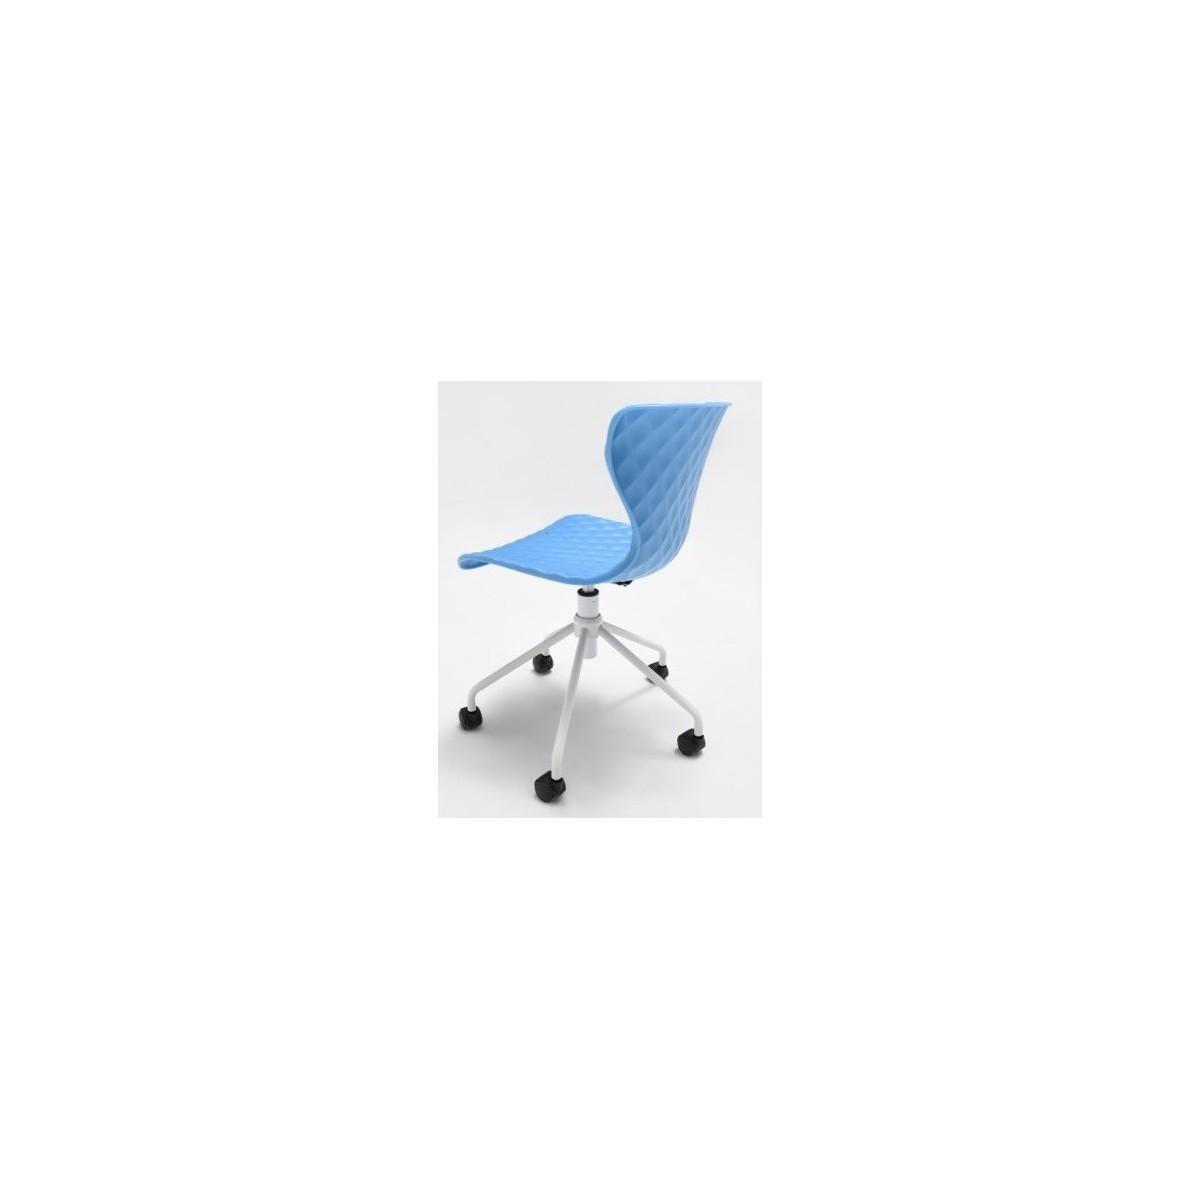 silla operativa dise o modelo lady pepa varios colores